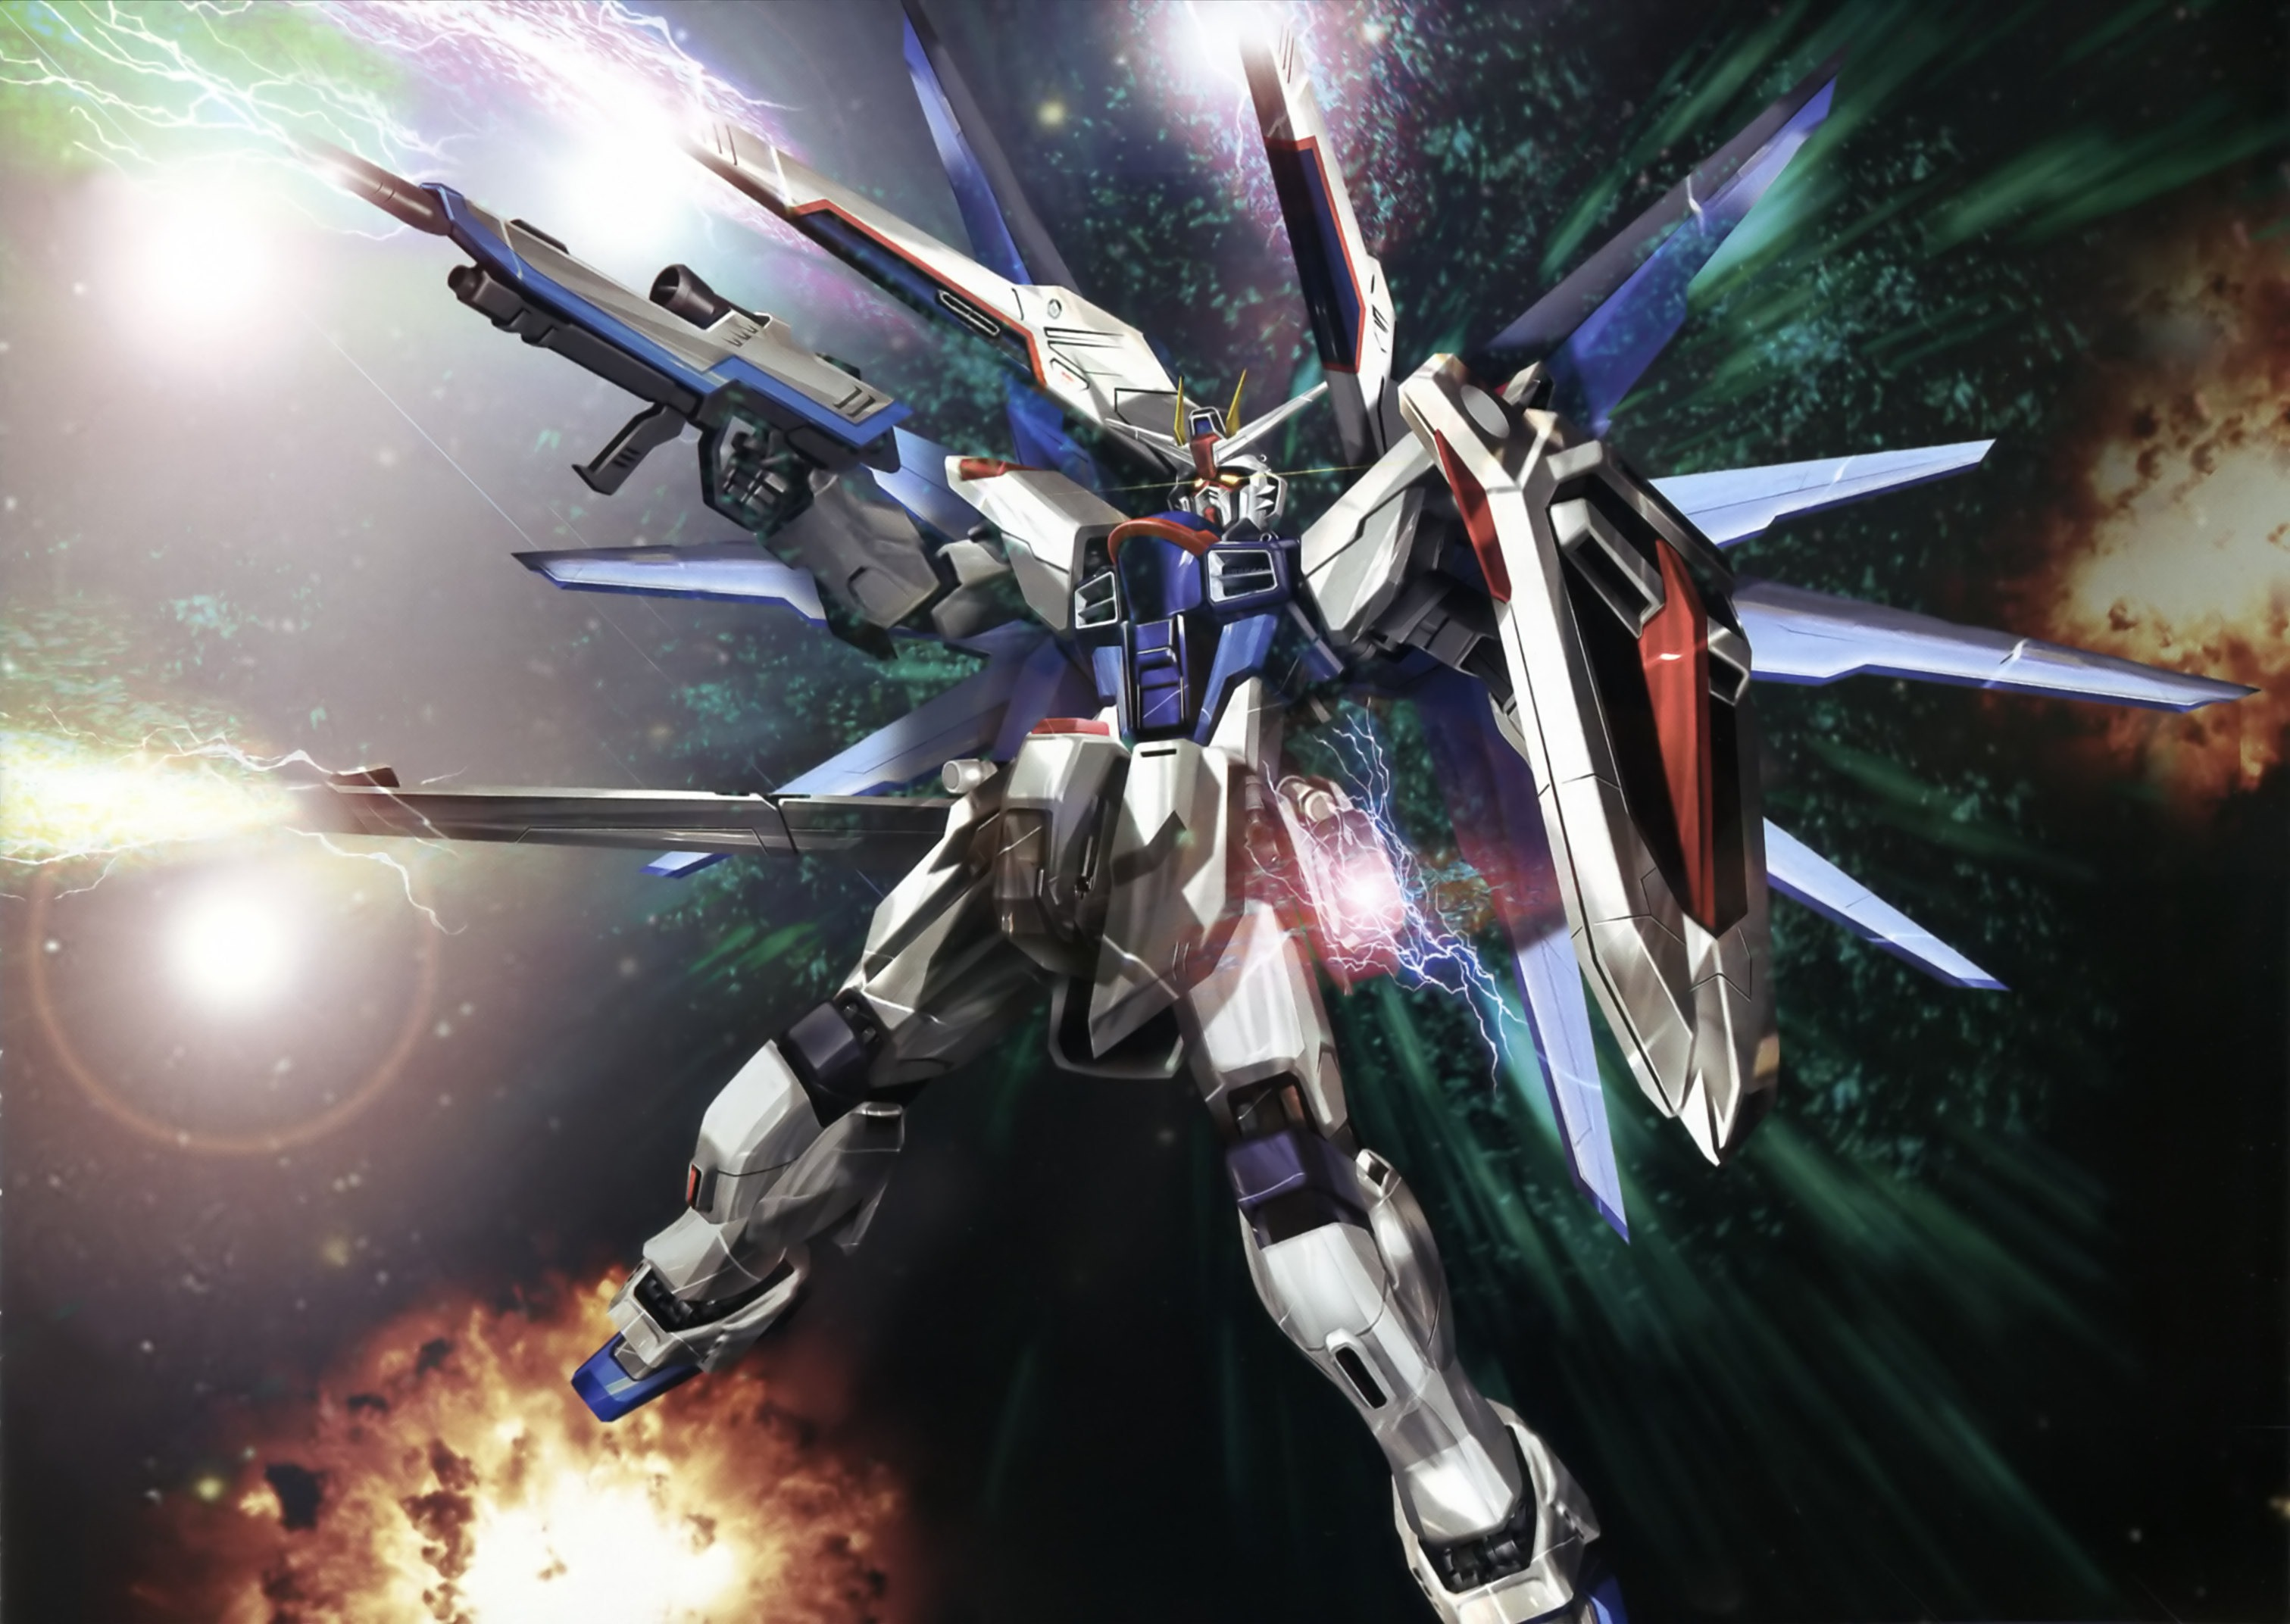 Gundam Perfect Files Wallpaper And Scan Gallery Minitokyo